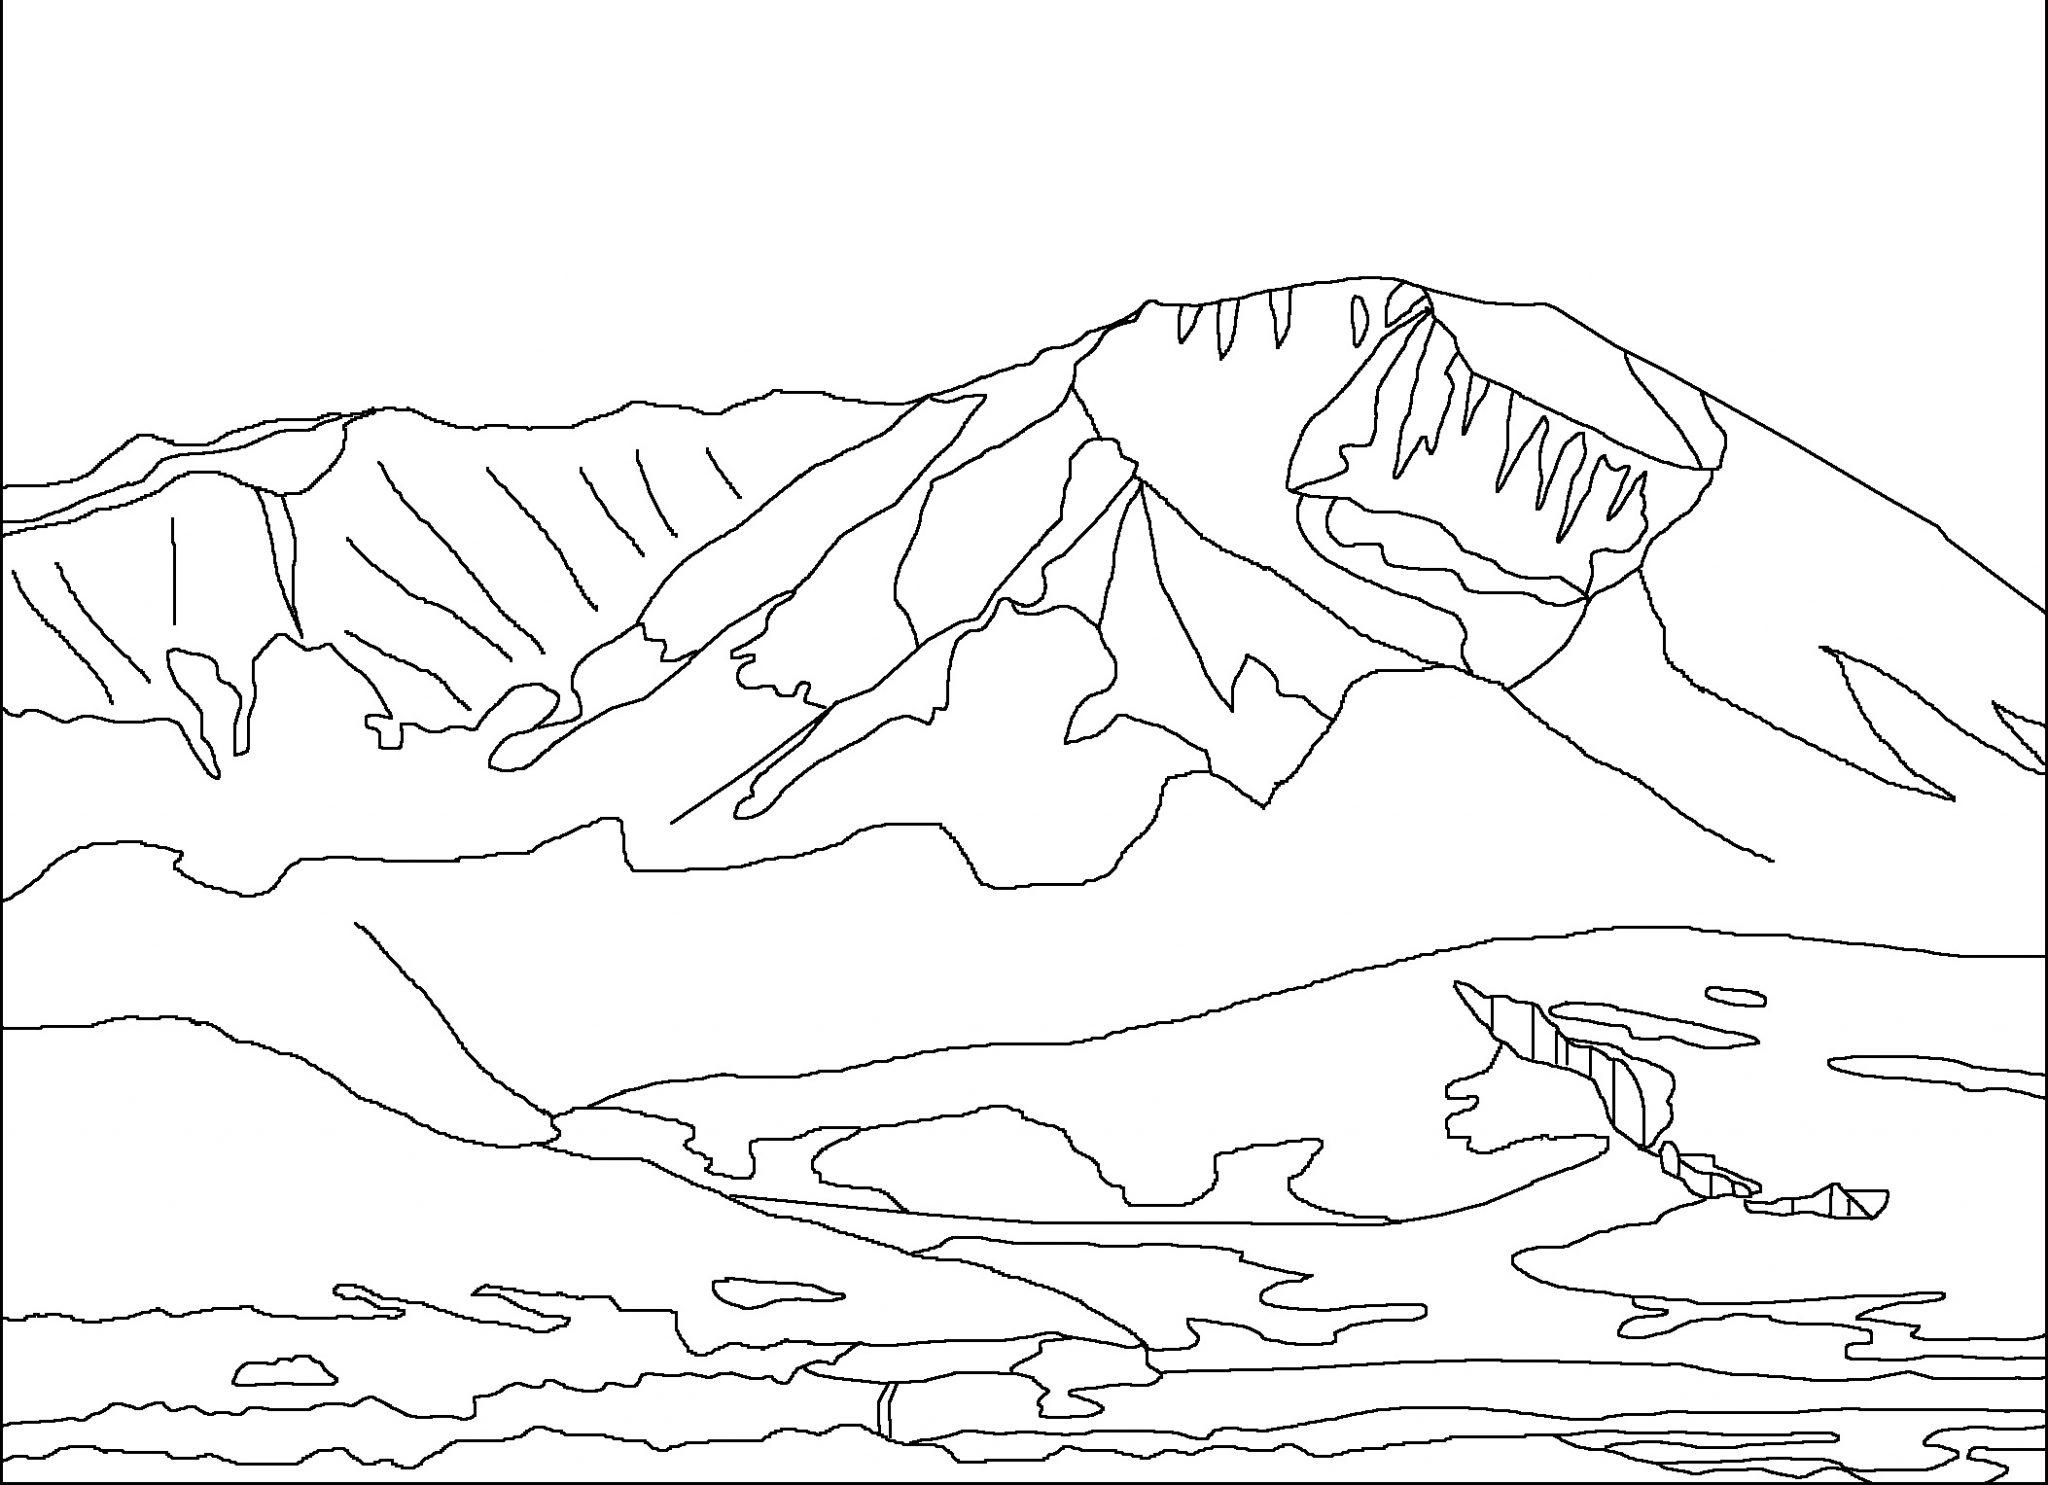 √15 Mewarnai Gambar Pemandangan Gunung Anak TK Paud Dan